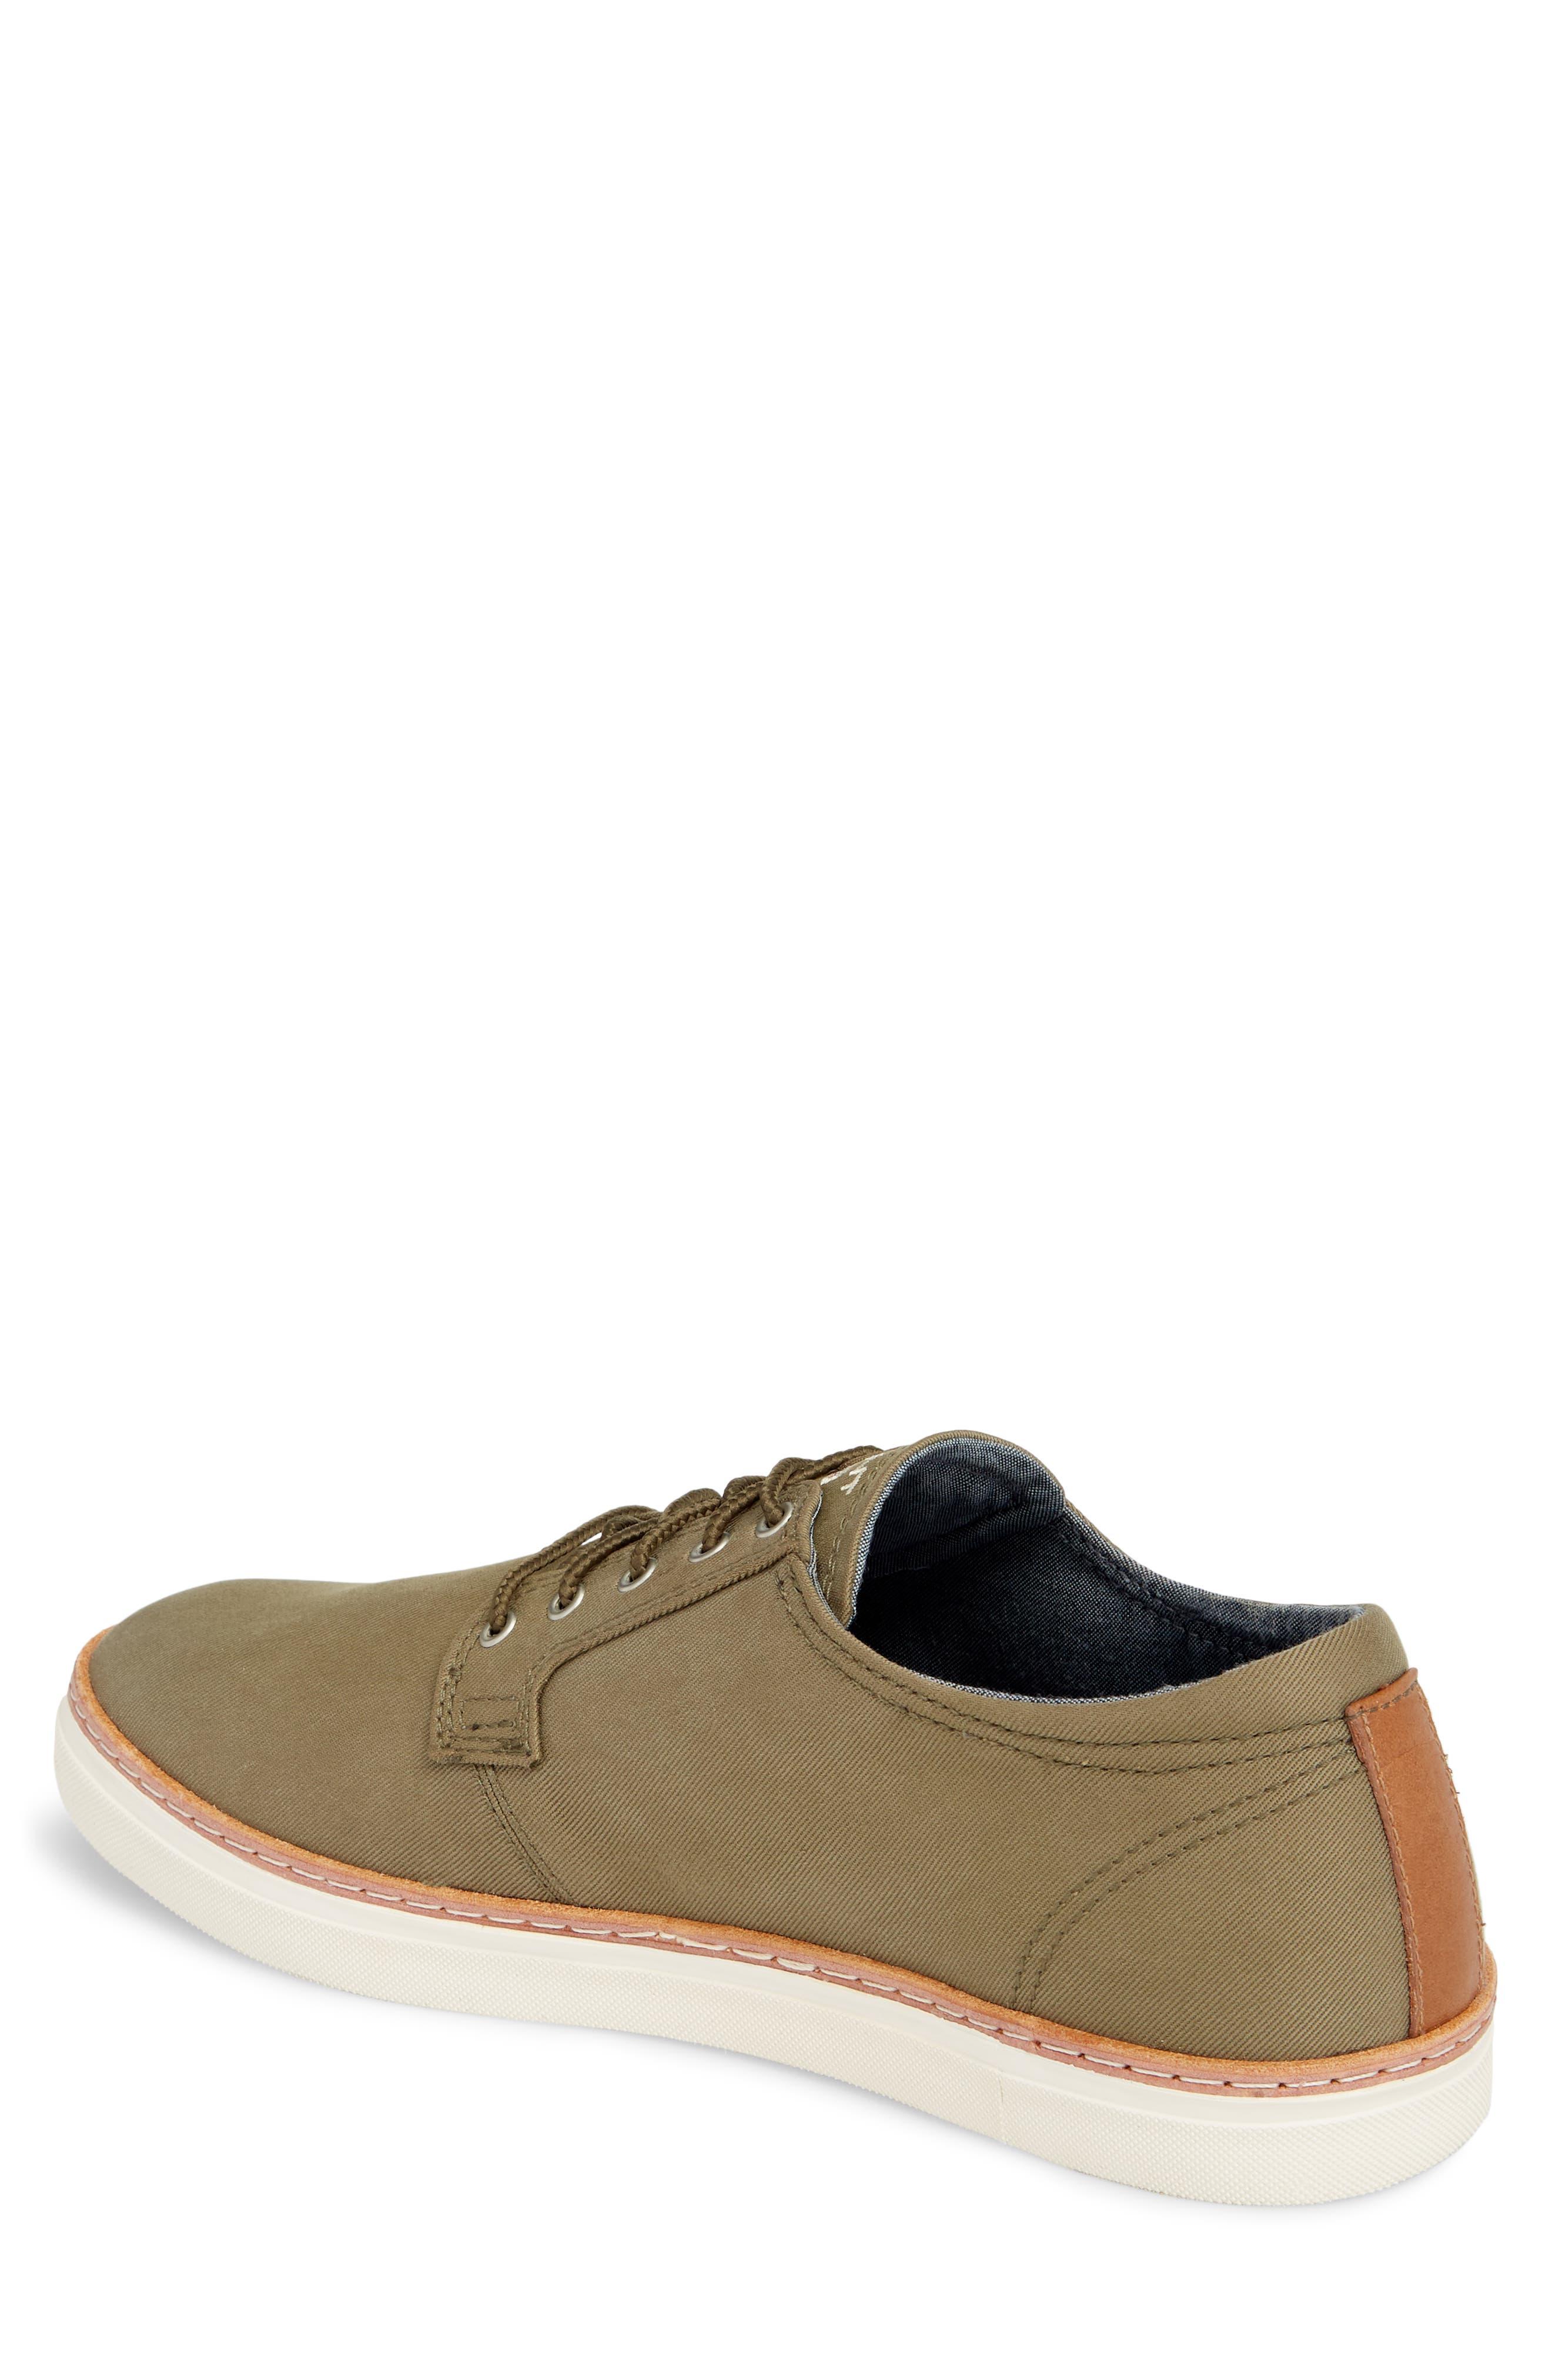 Bari Sneaker,                             Alternate thumbnail 2, color,                             Kalamata Green